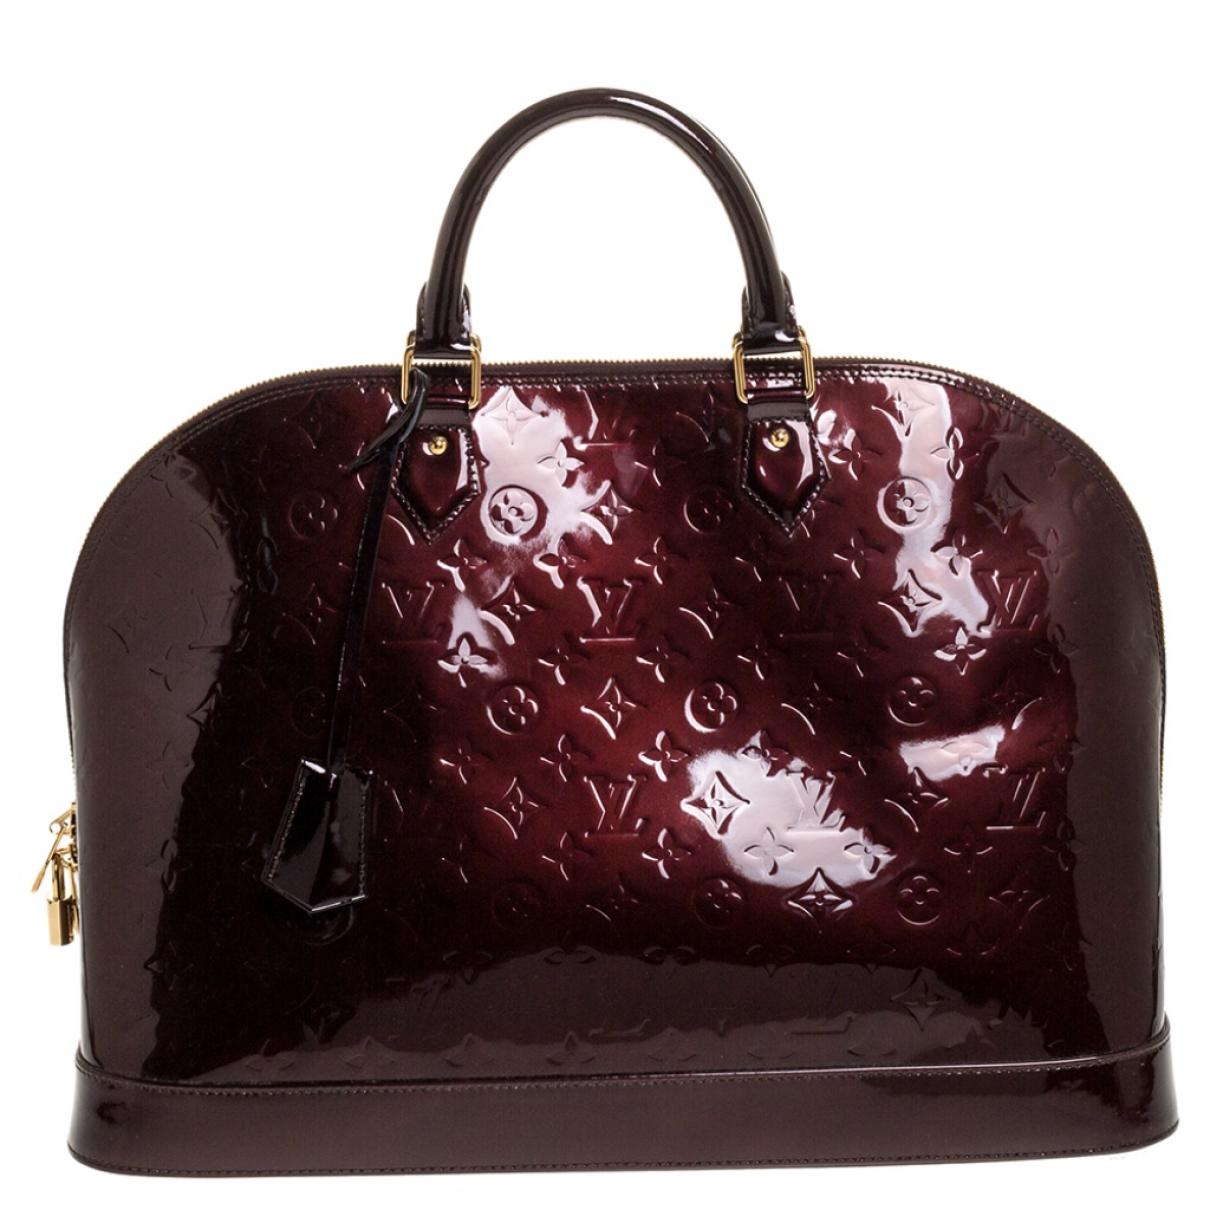 Louis Vuitton Alma Patent leather handbag for Women N